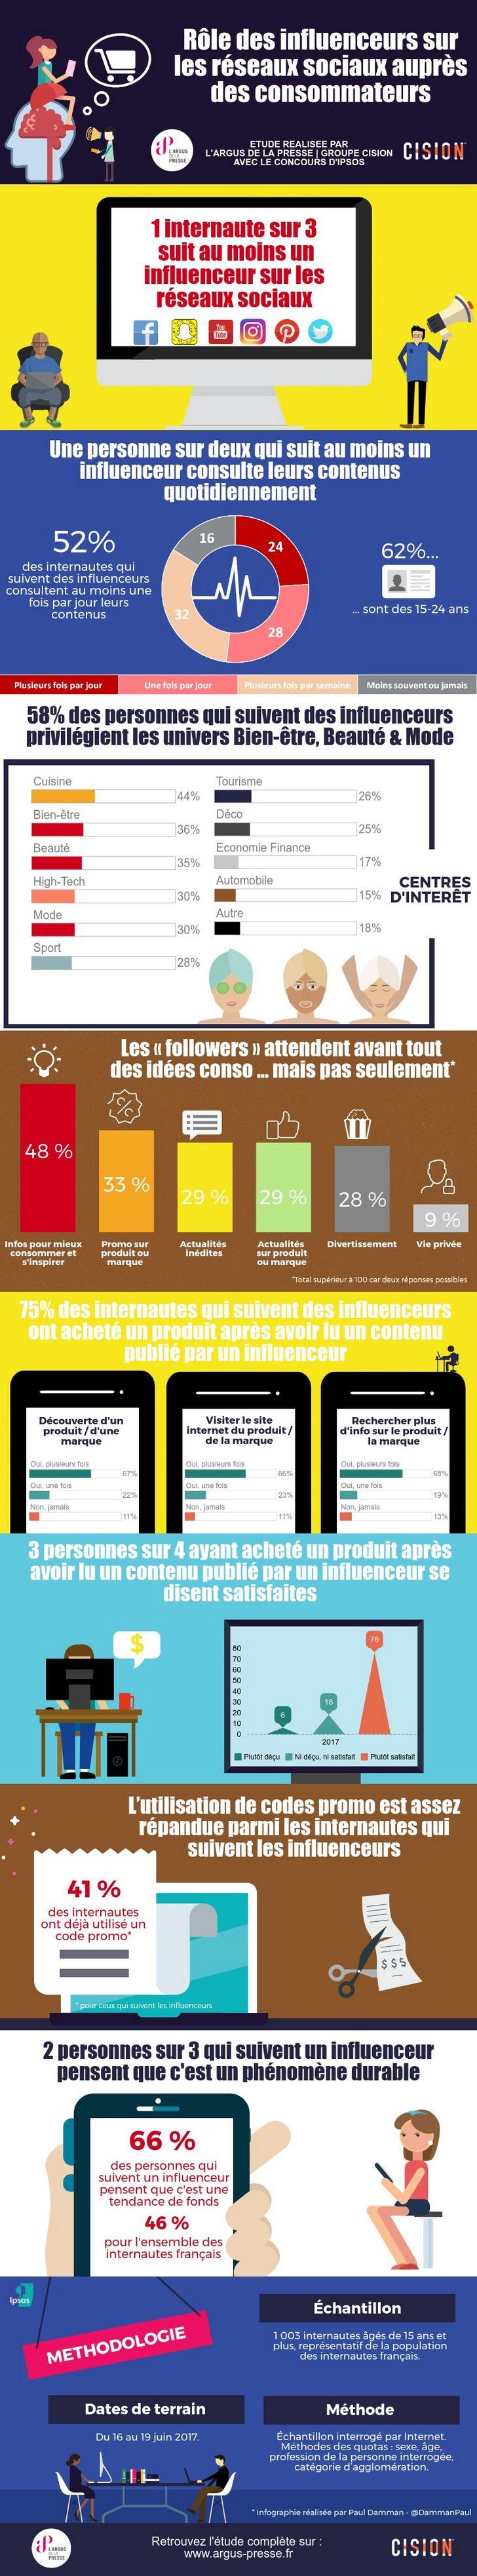 Infographie influenceurs